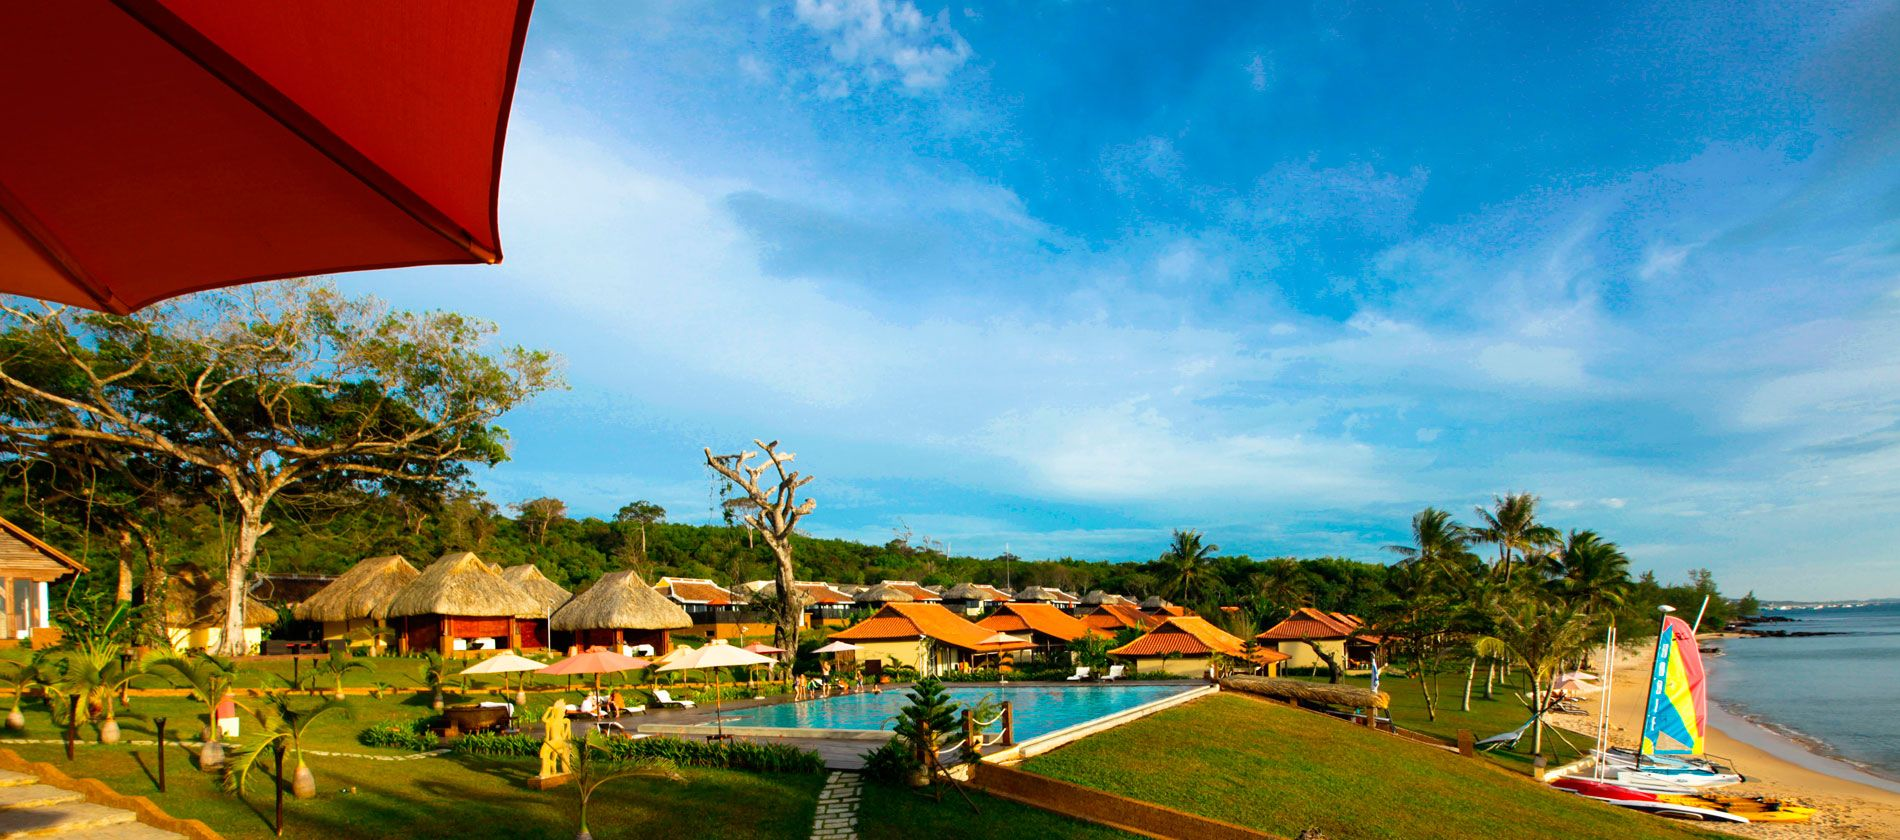 Chen Sea Resort And Spa Phu Quoc Island Hotel In Vietnam